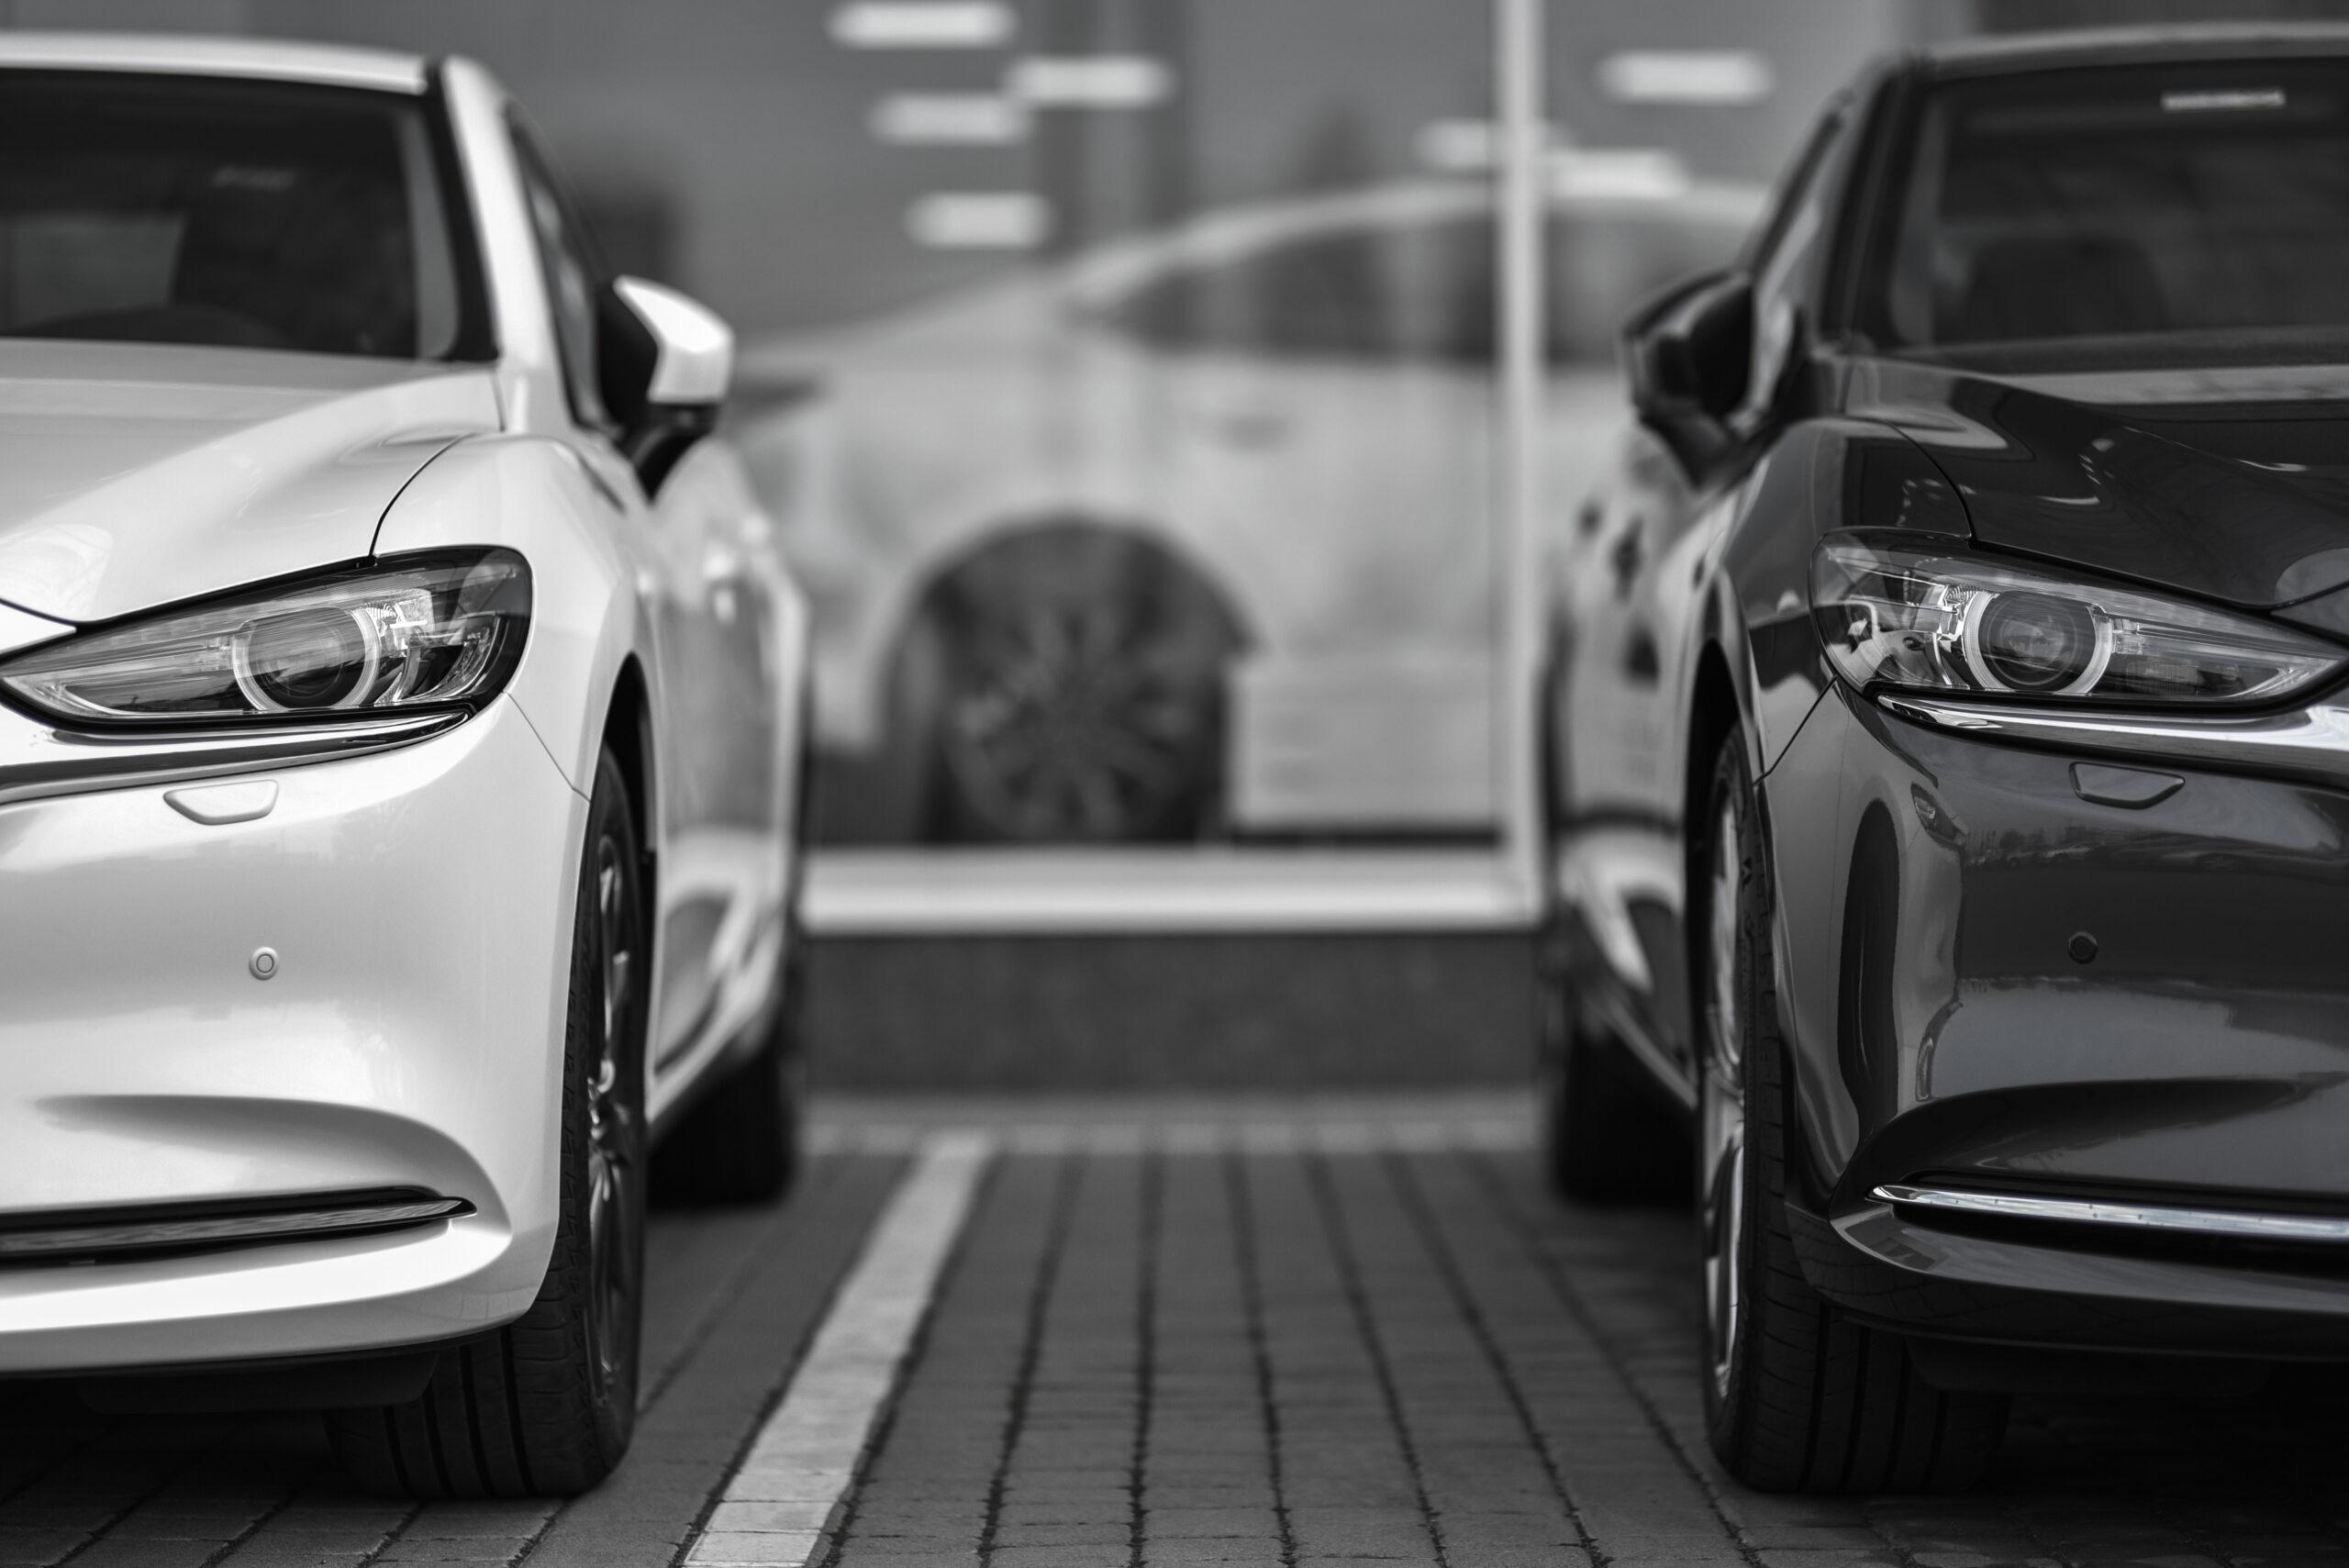 Geprüfte Fahrzeuge mit Zertifikat